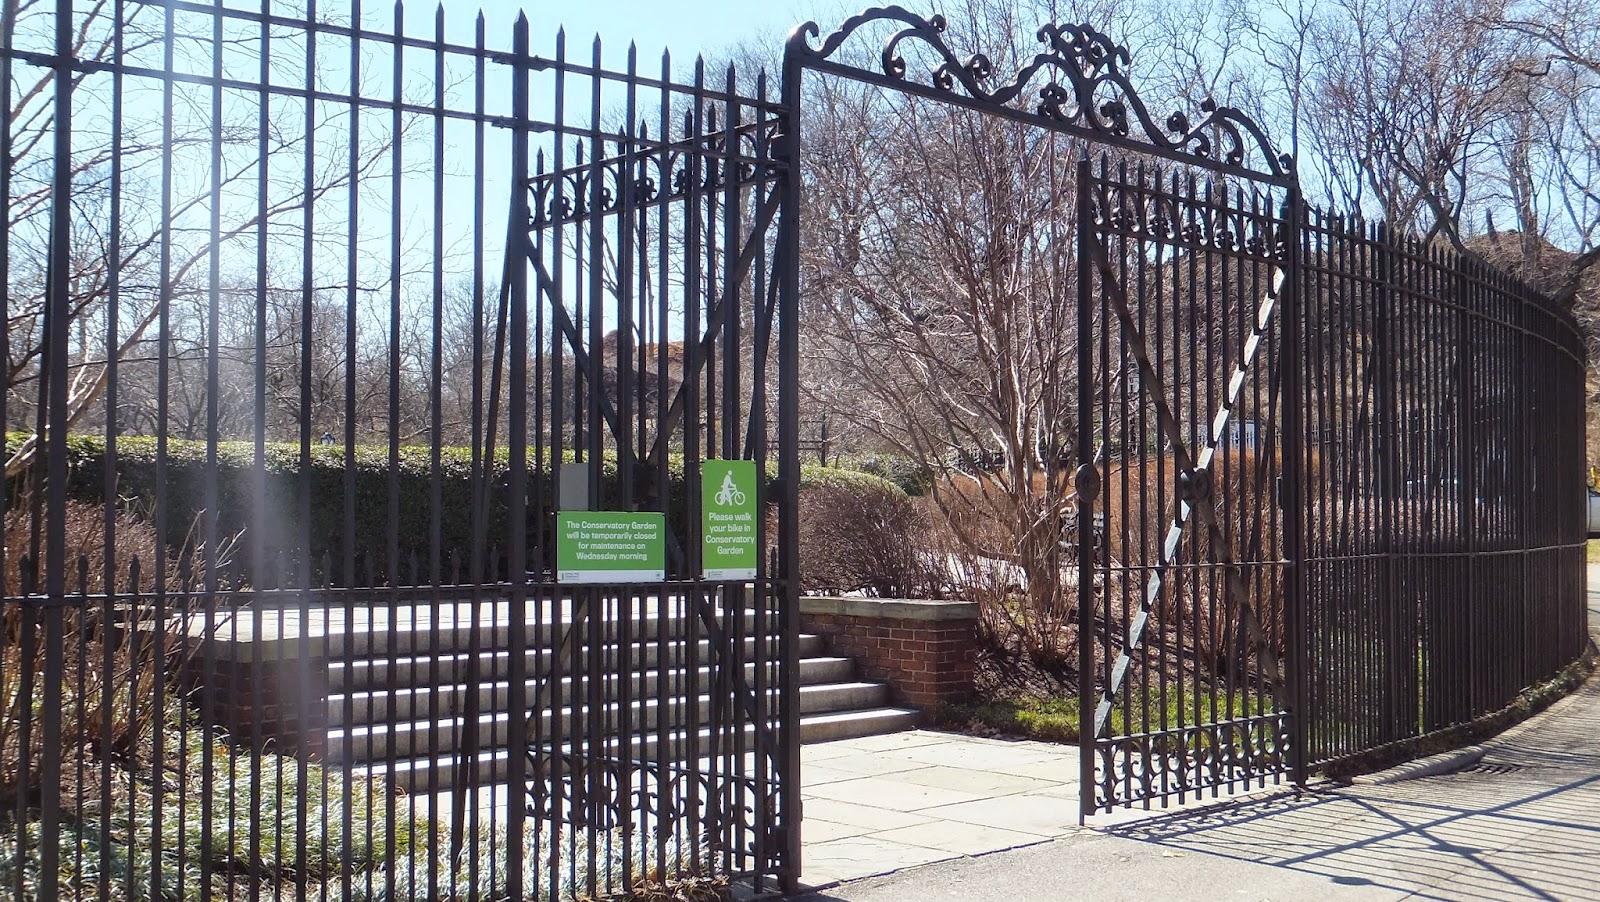 Conservatory Garden, Central Park, Nueva York, Manhattan, Elisa N, Blog de Viajes Argentina